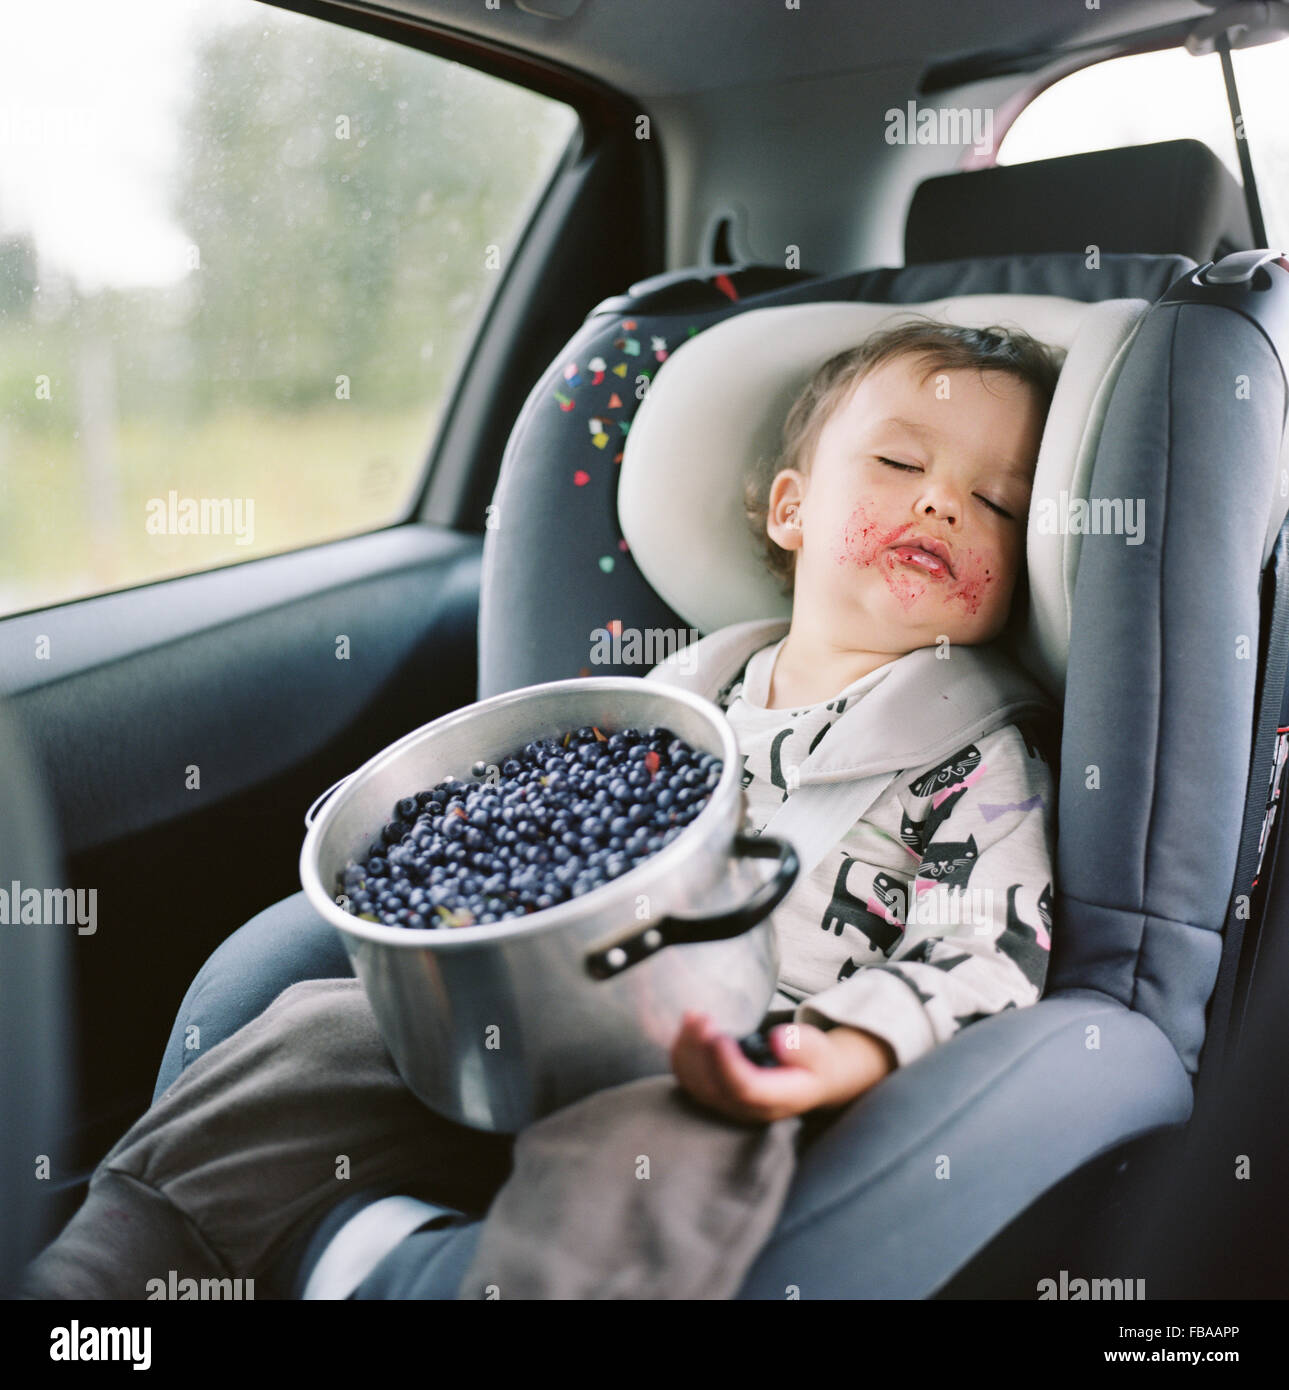 La Finlande, Uusimaa, Lapinjarvi, Portrait of Girl (2-3) sleeping in car seat avec pot plein de bleuets au tour Photo Stock